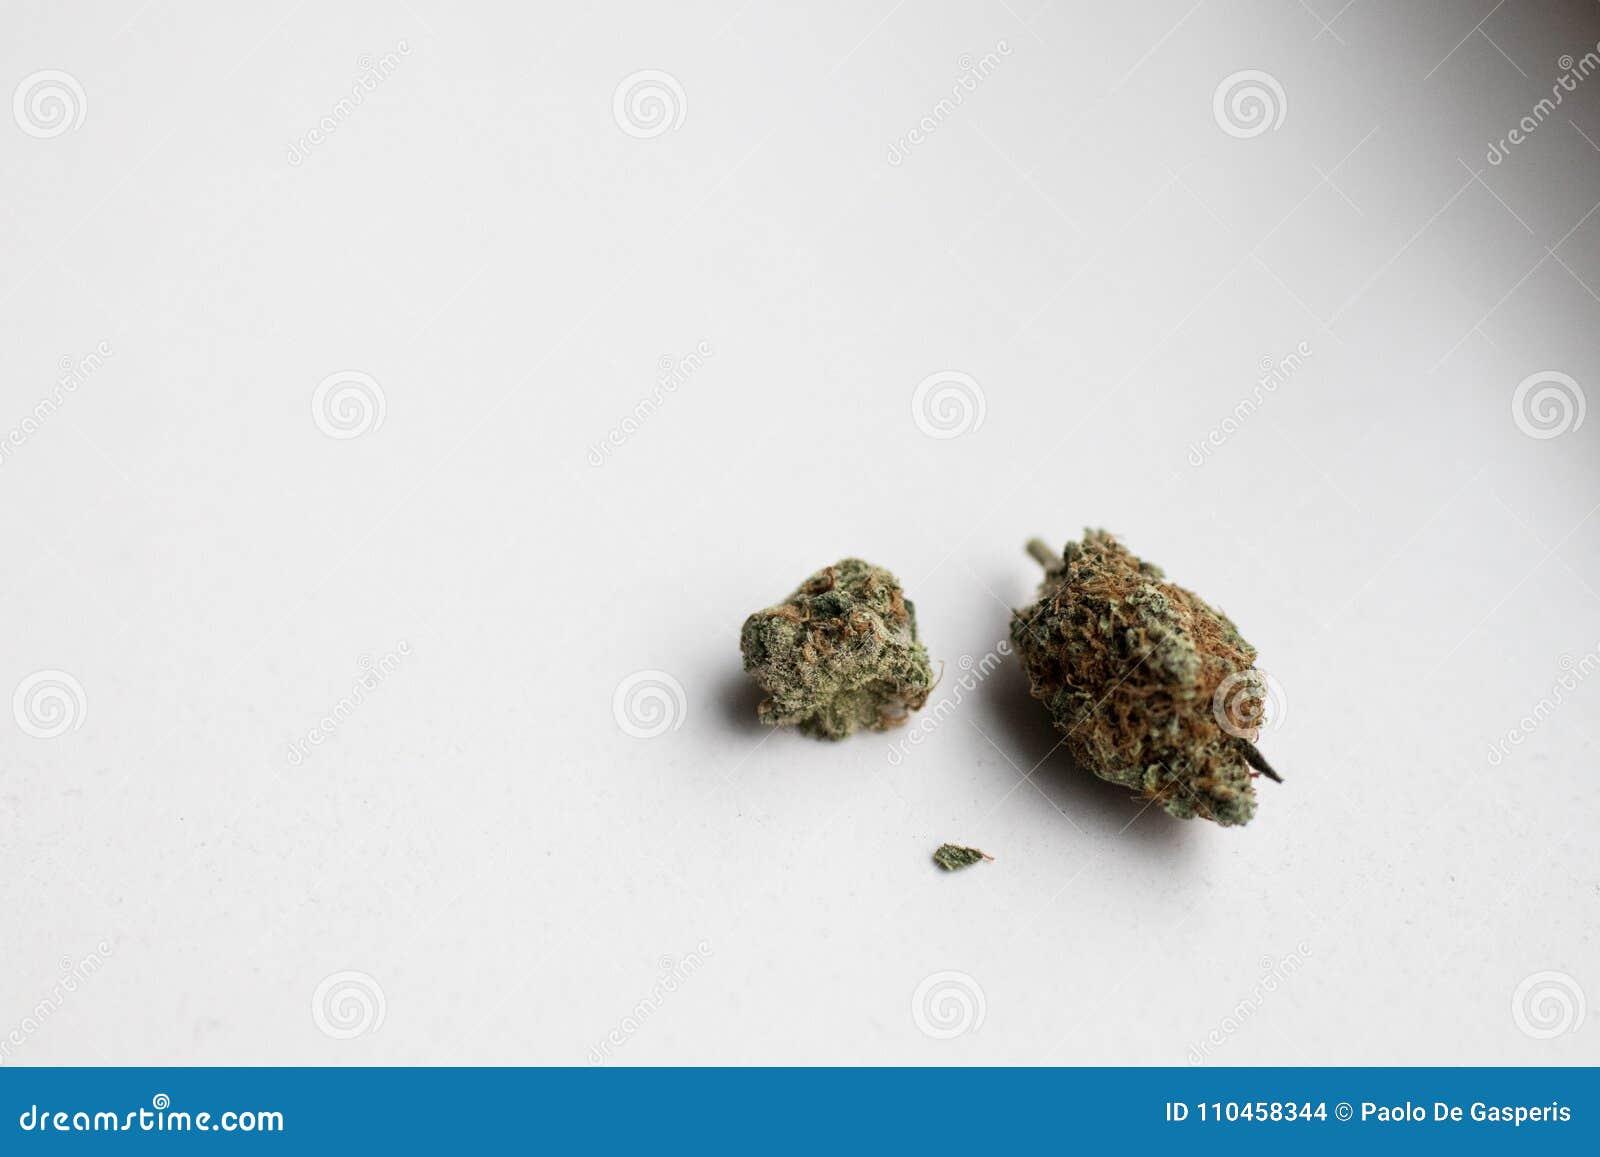 Inflorescence av laglig cannabis i holland på en vit bakgrund